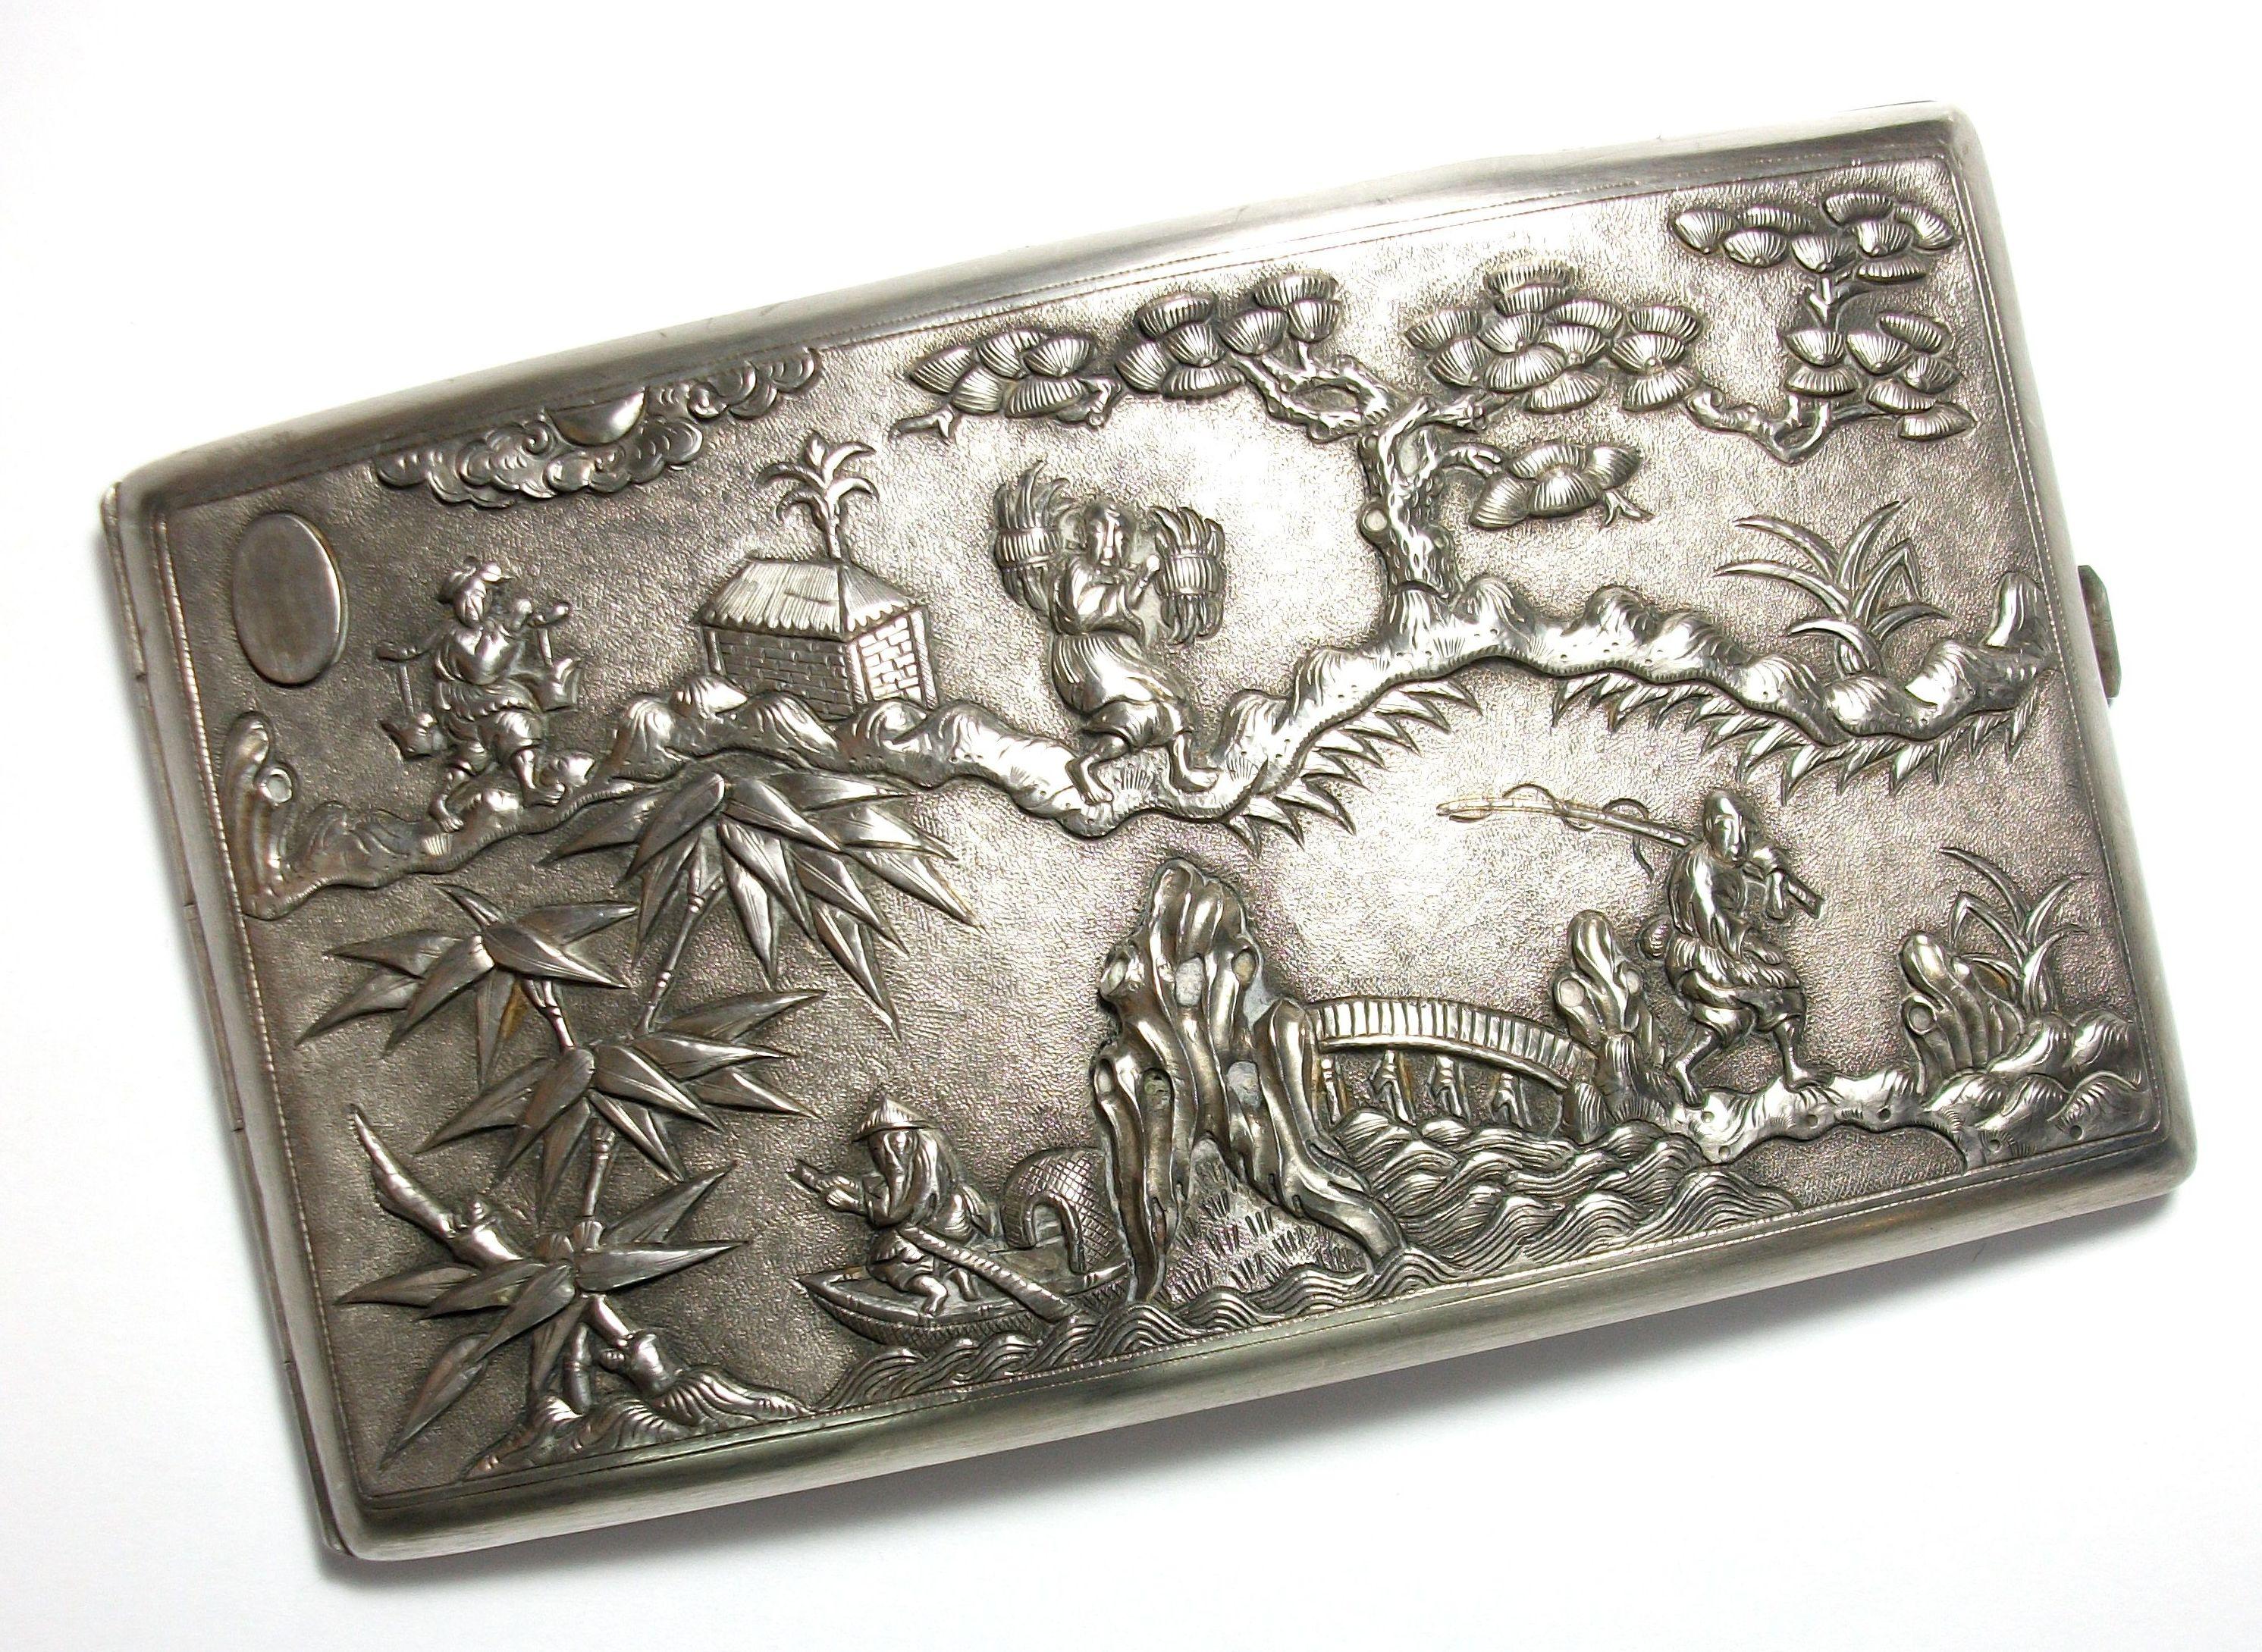 Tabaquera de plata con chinerias. Finales S. XIX. VENDIDA